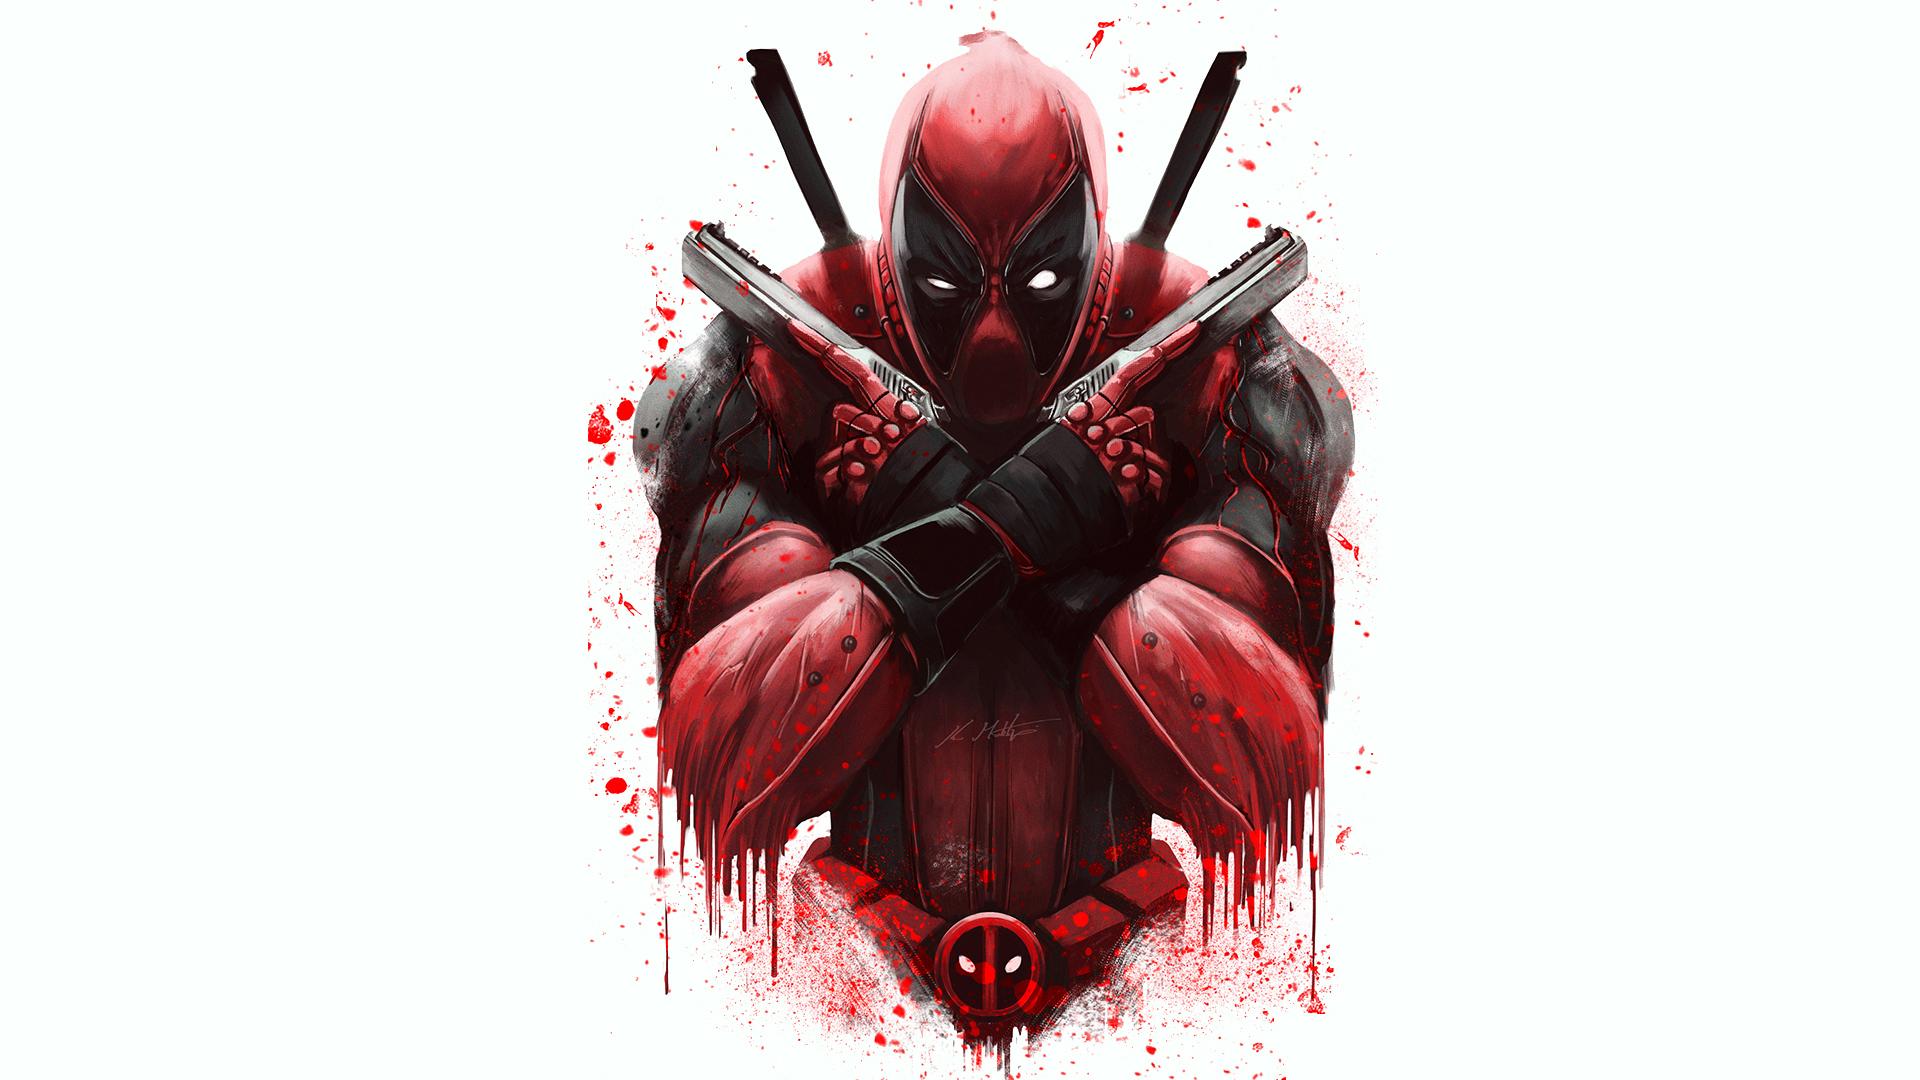 Marvel Deadpool Artwork Full HD Wallpaper